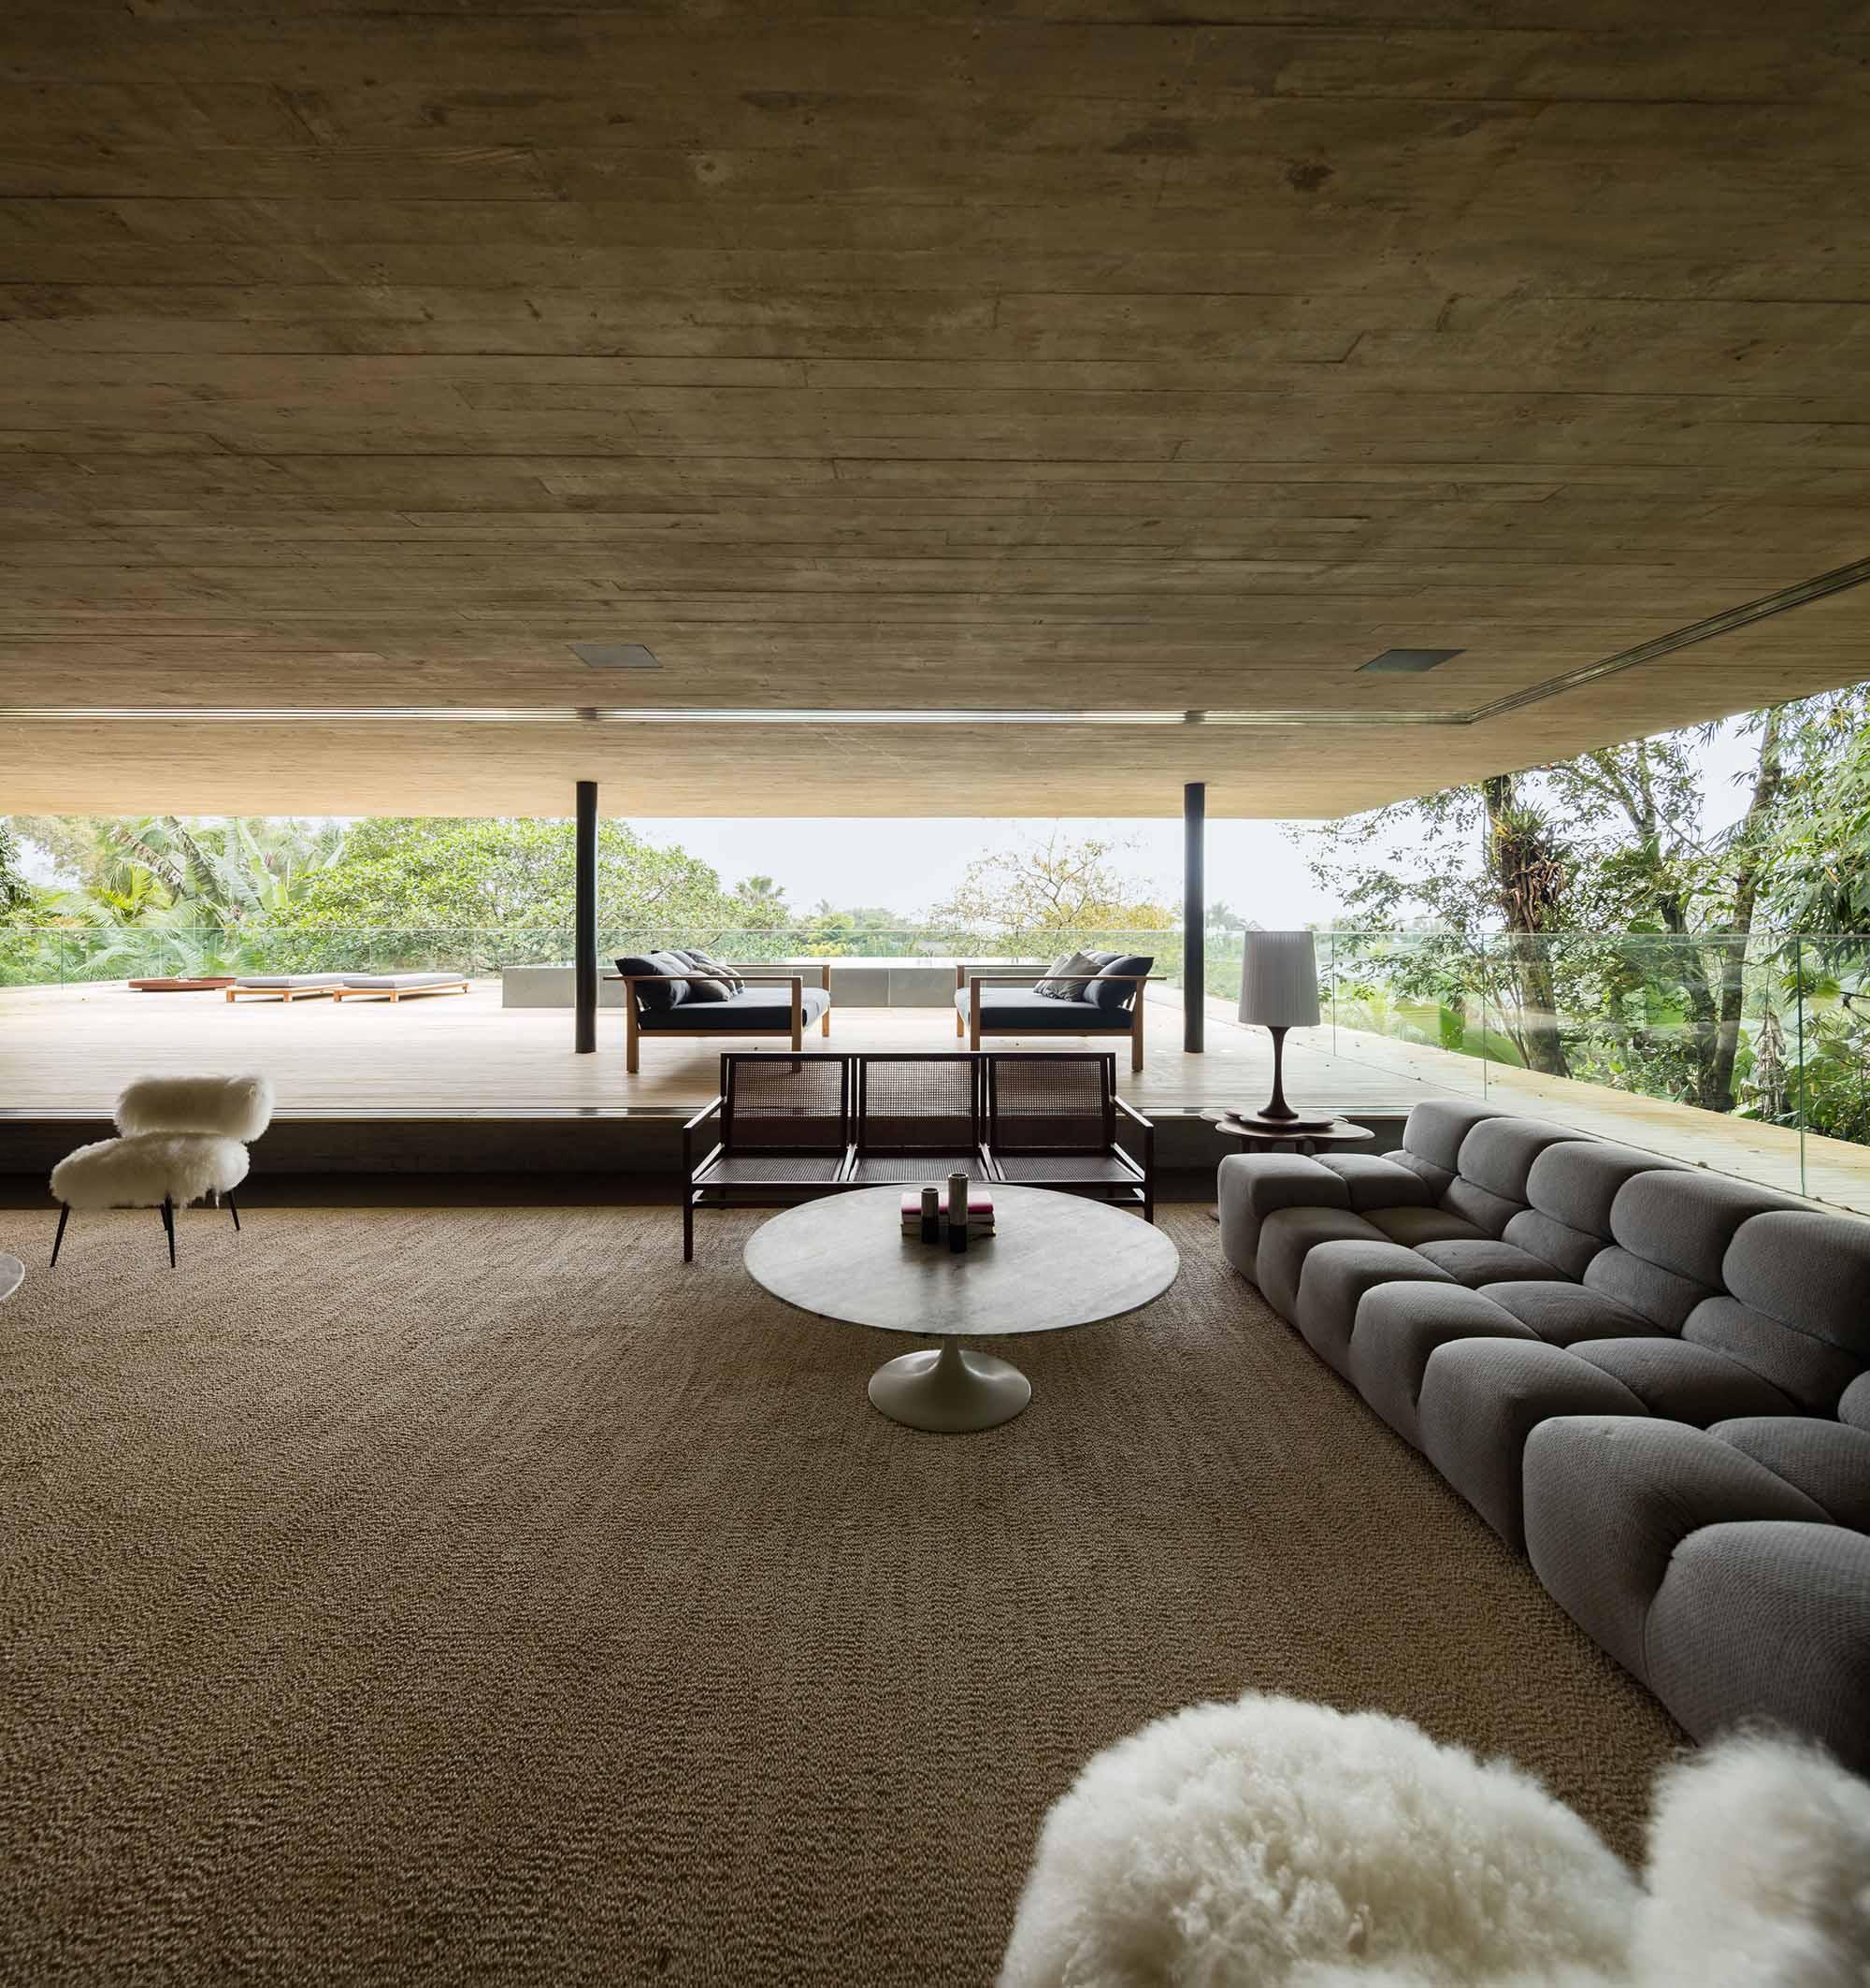 H-House-Life-Jungle-House-Casa-Da-Mata-studio-mk27-mk27_namata_fernandoguerra_medium(26).JPG